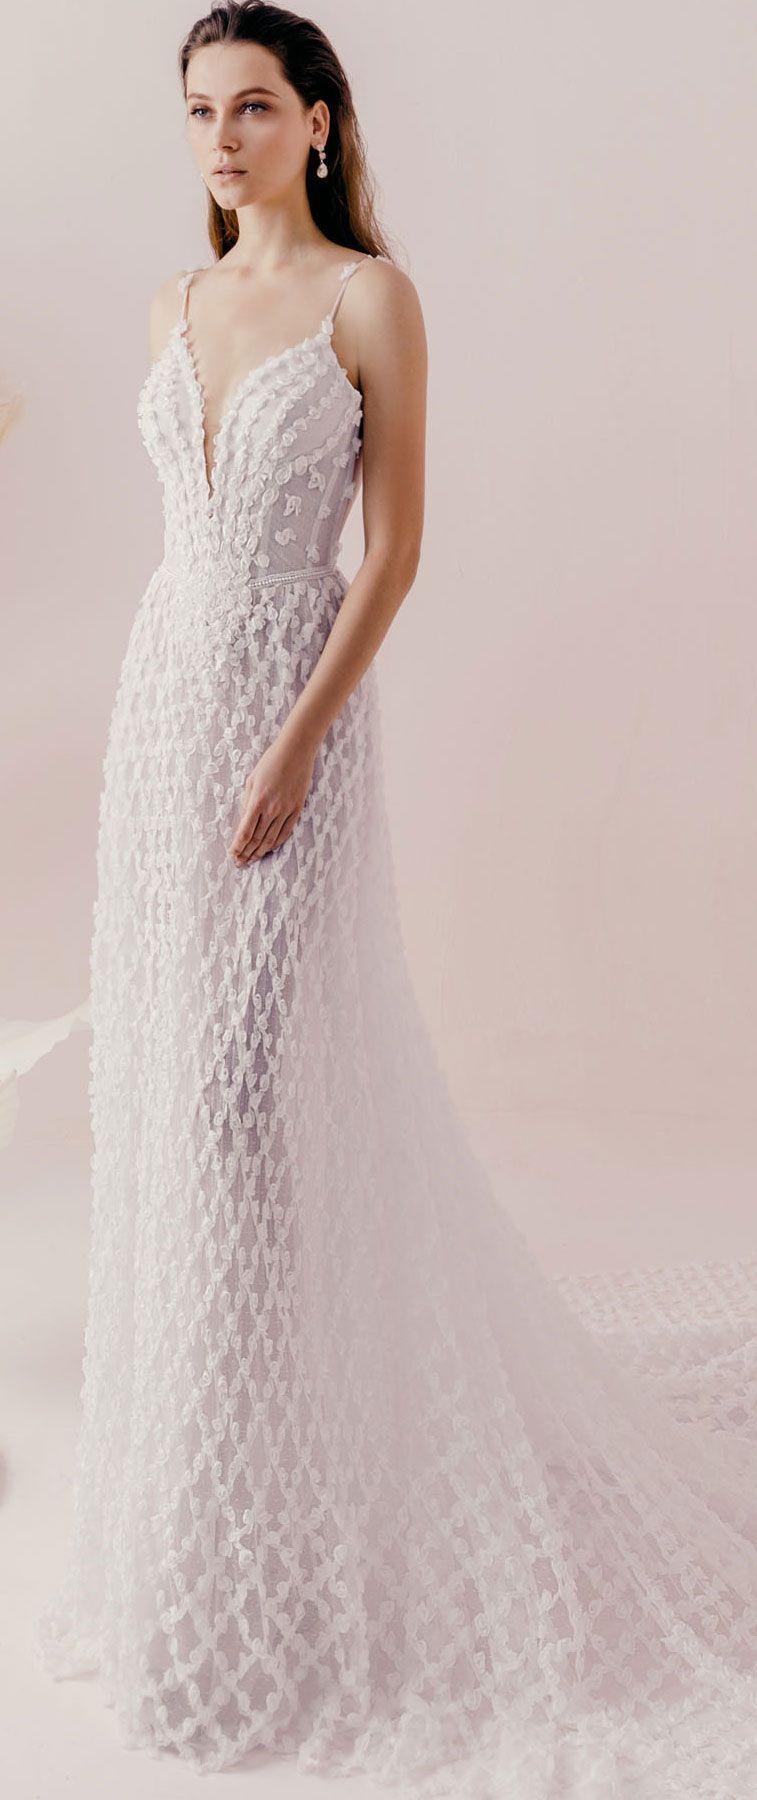 Irena Burshtein 2018 Wedding Dresses